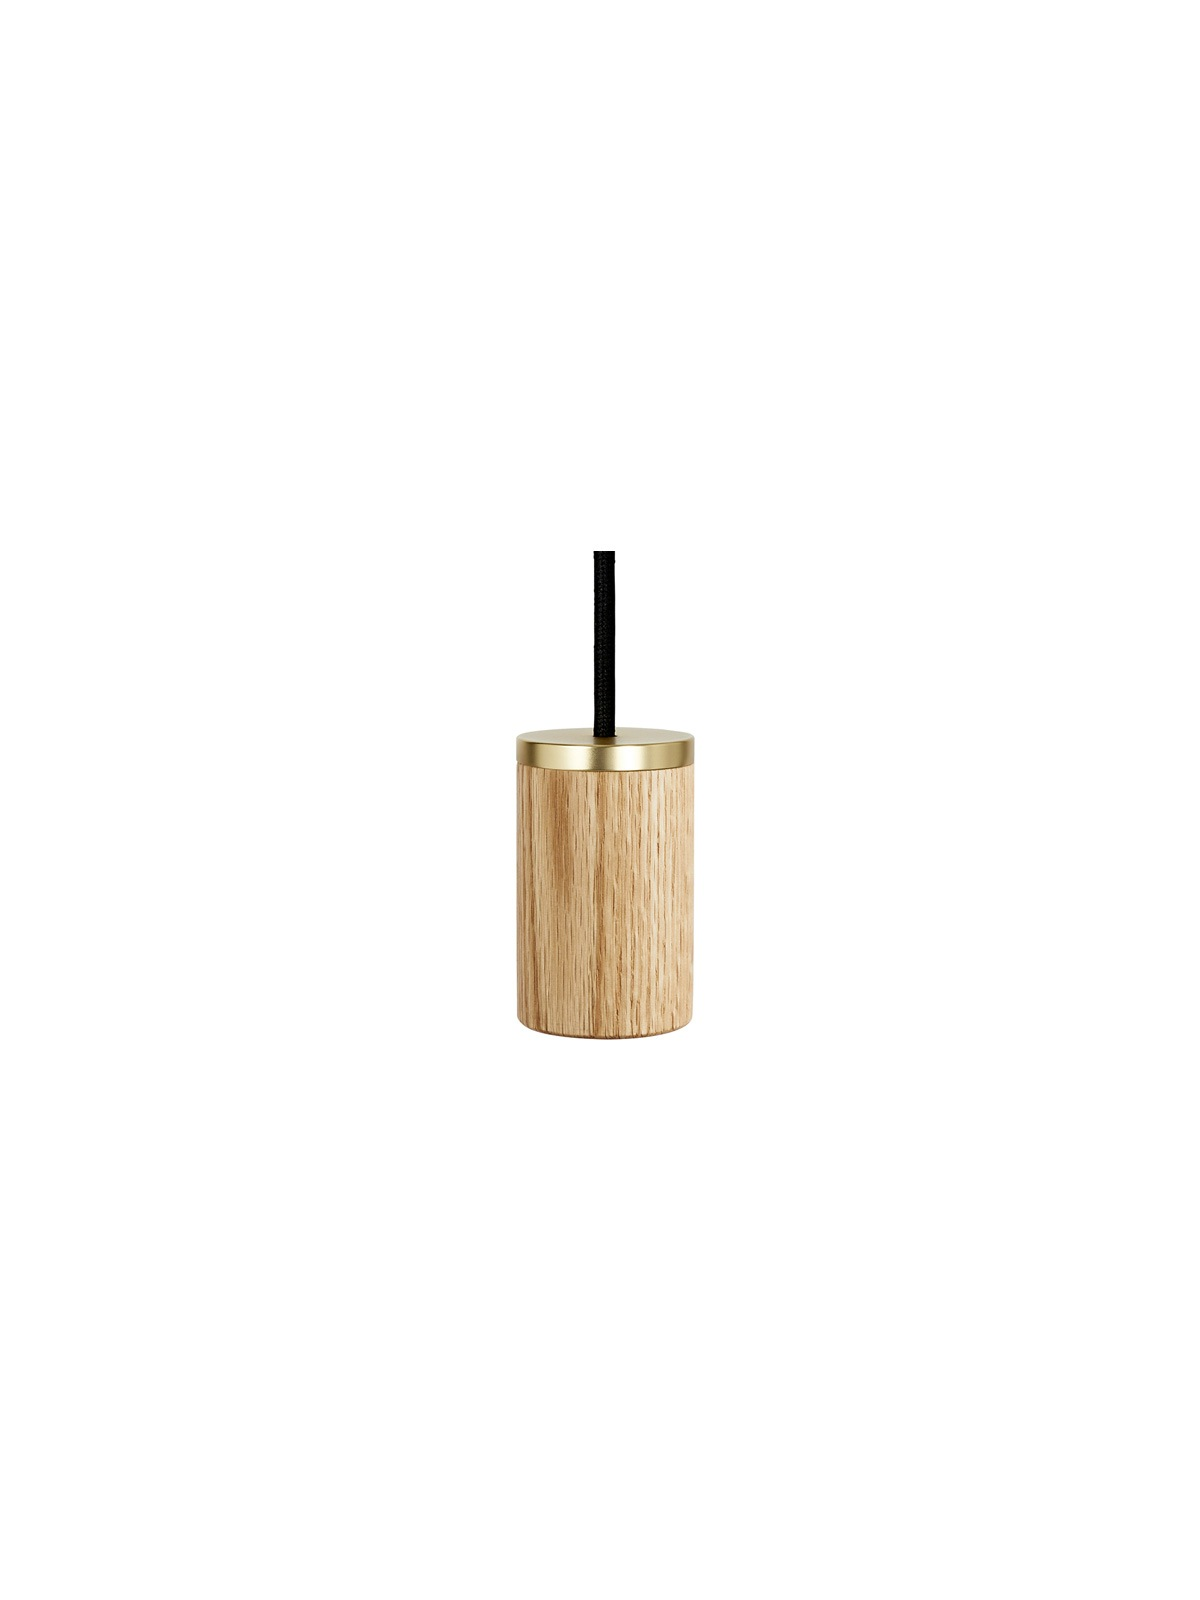 Fassungen Pendant Light Holz Tala